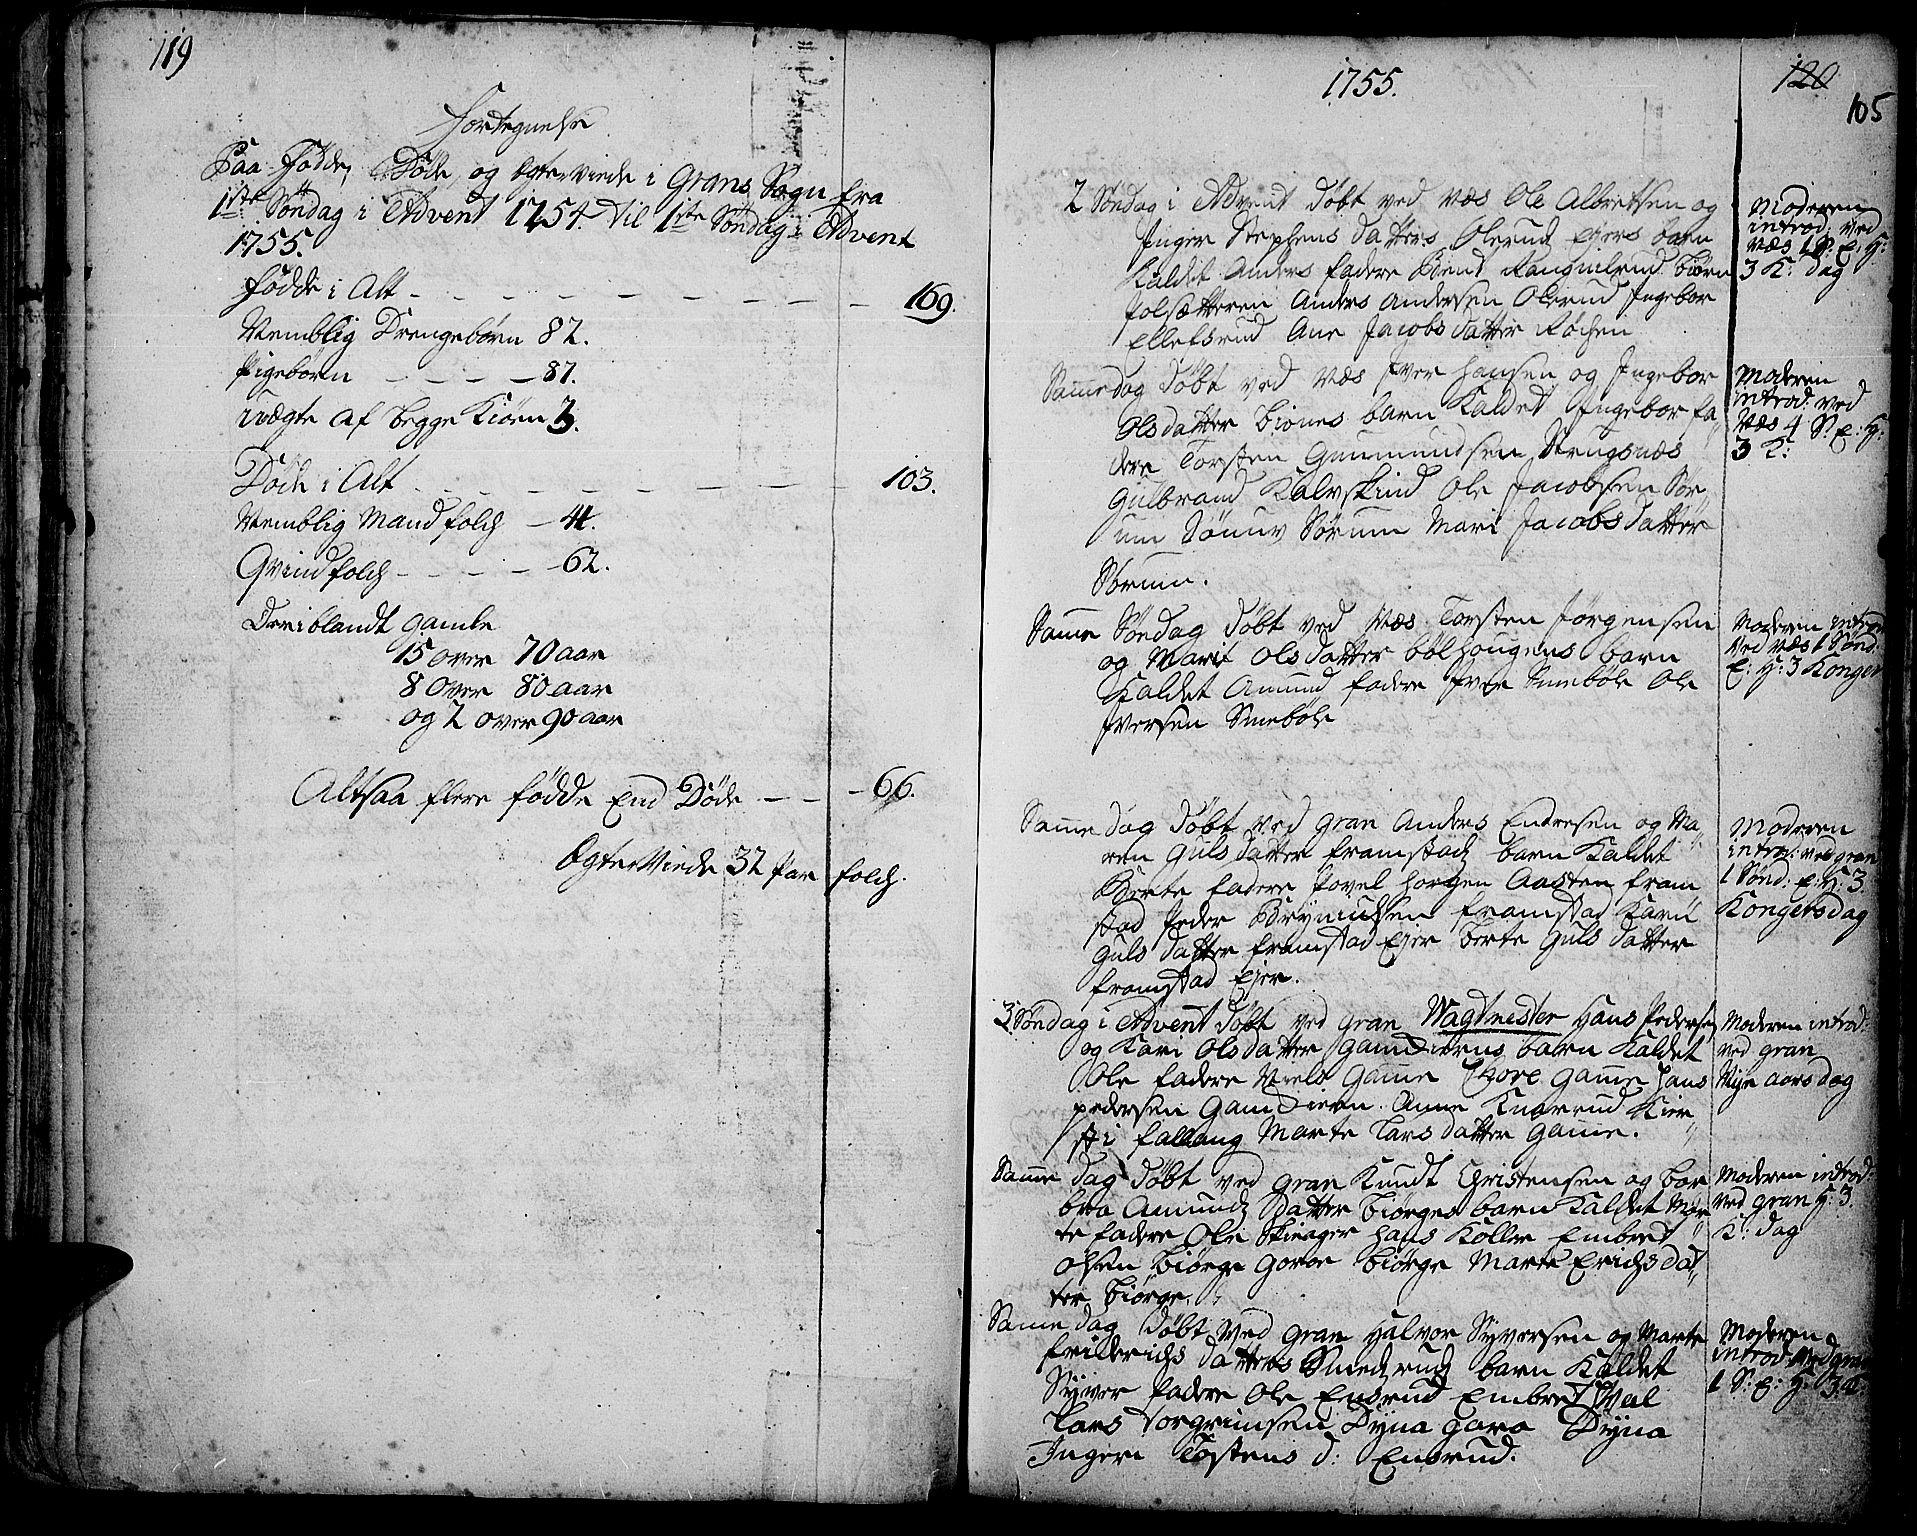 SAH, Gran prestekontor, Ministerialbok nr. 3, 1745-1758, s. 105